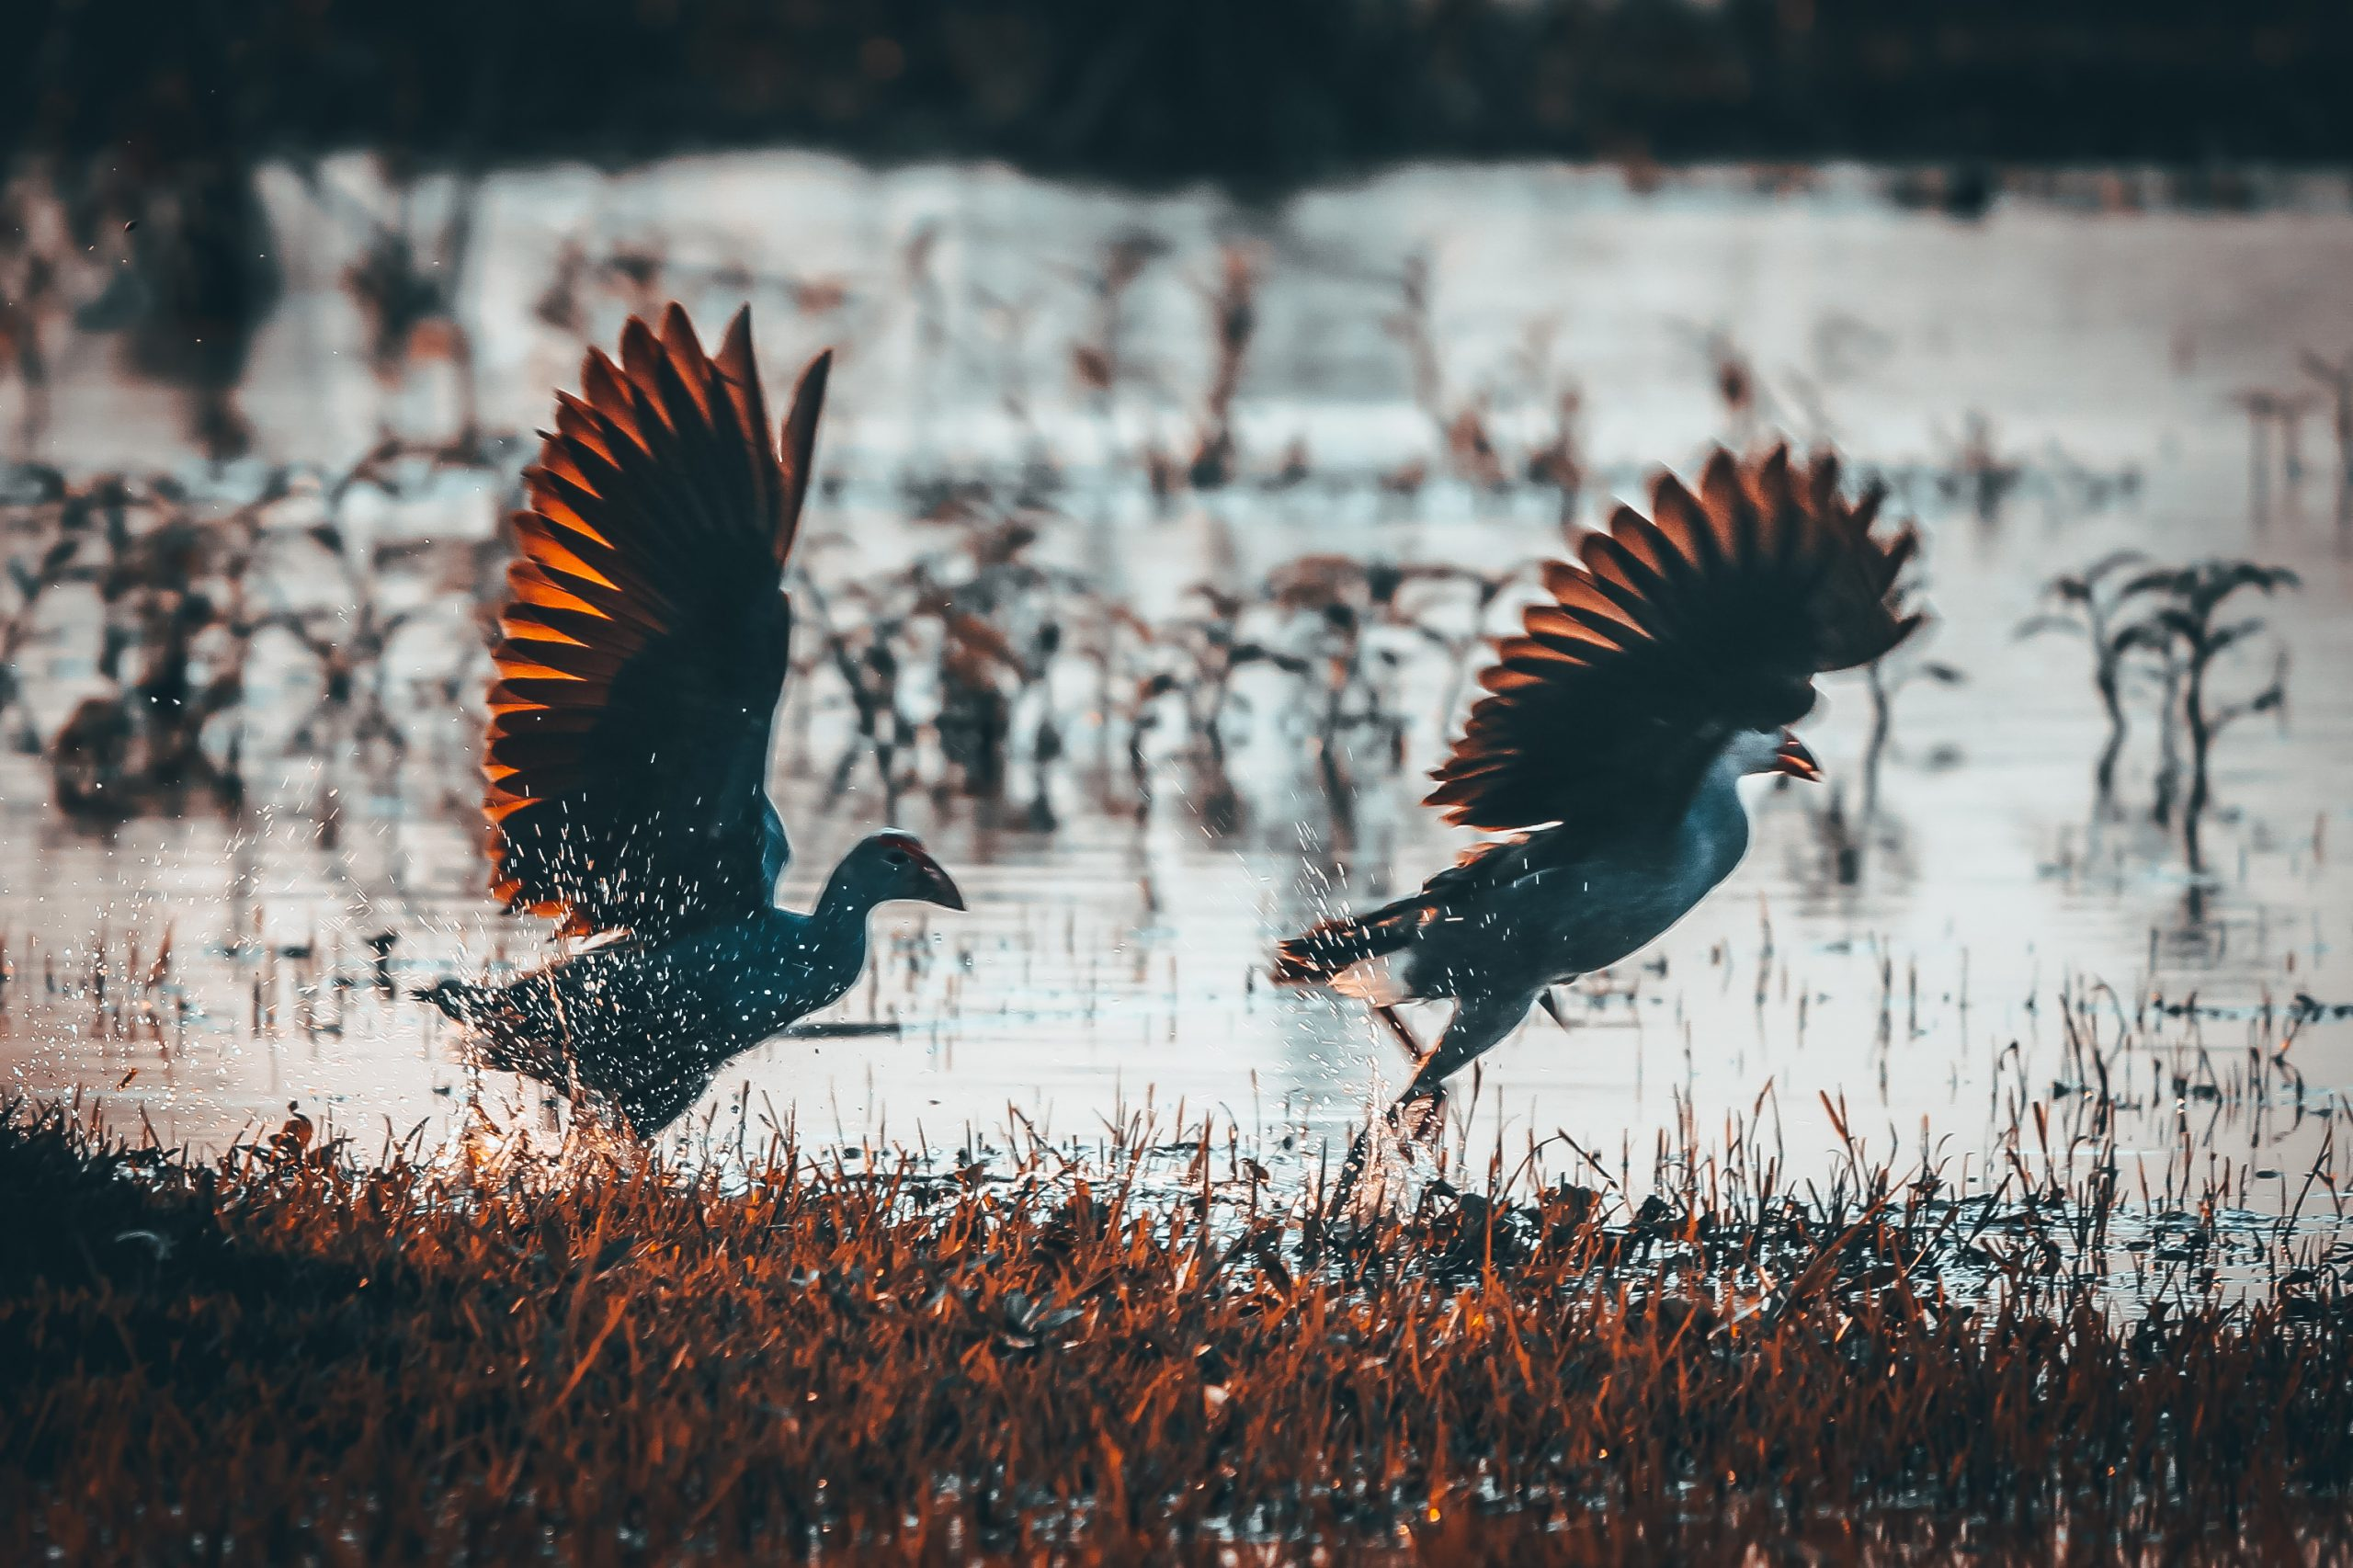 Birds flying over a pond